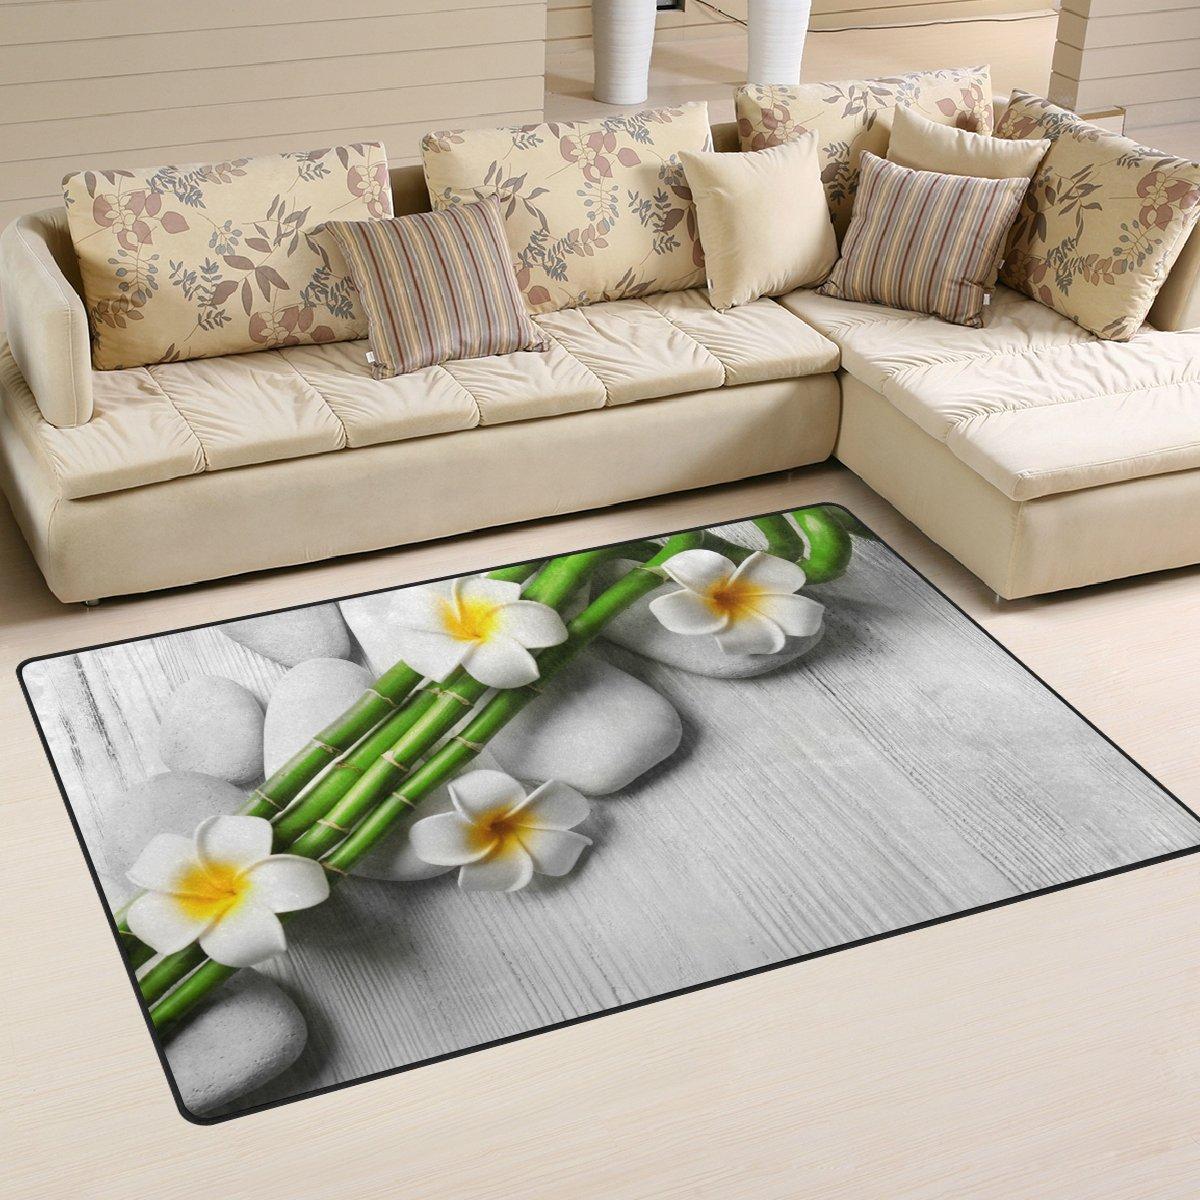 WellLee Area Rug,Beautiful Spa Bamboo On Light Floor Rug Non-slip Doormat for Living Dining Dorm Room Bedroom Decor 60x39 Inch